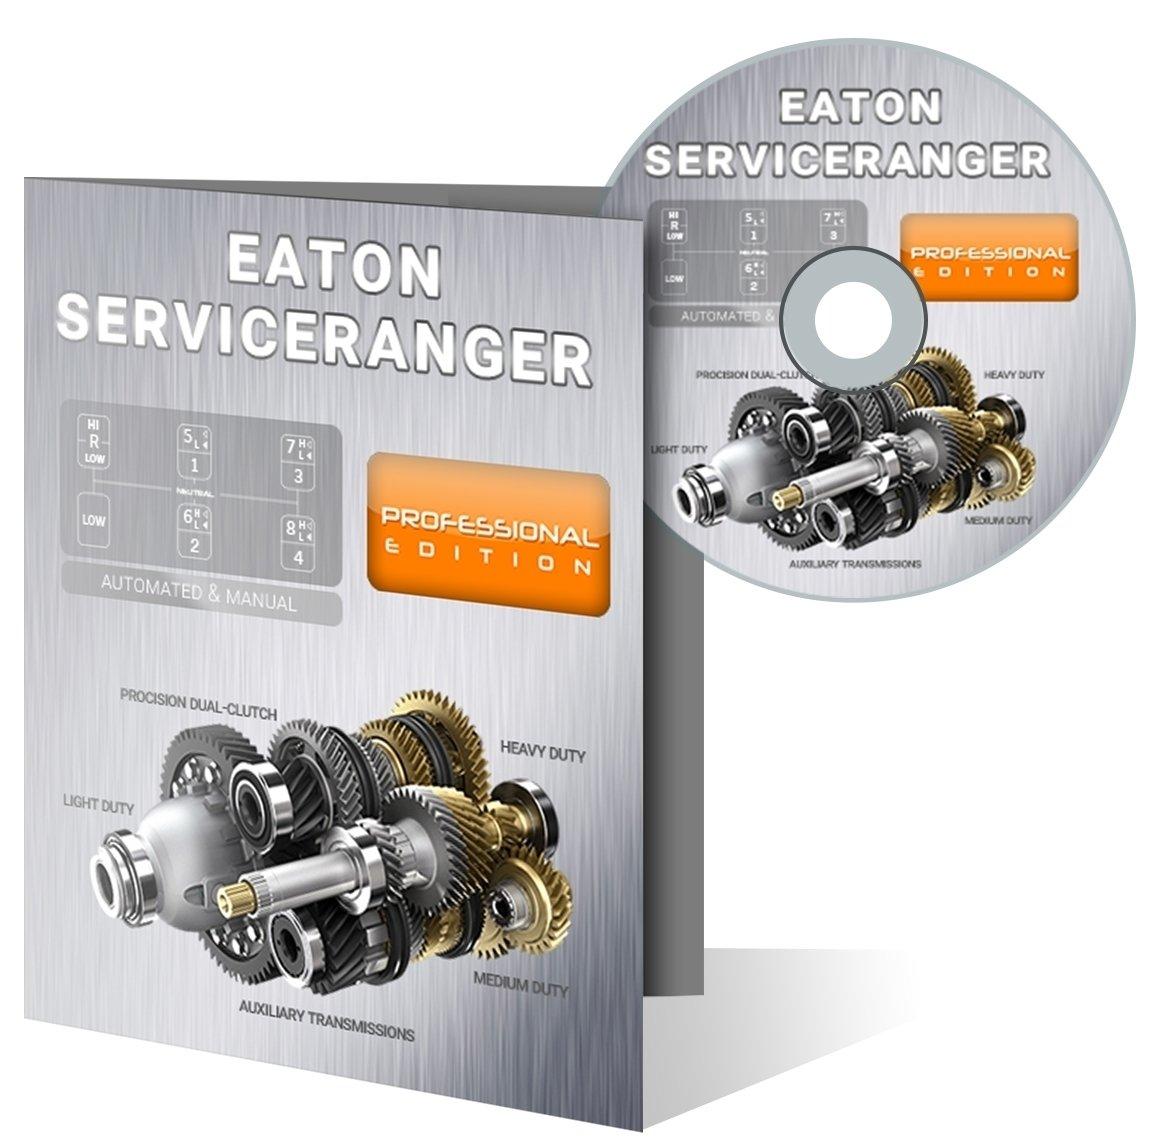 Eaton ServiceRanger Diagnostics Professional Edition